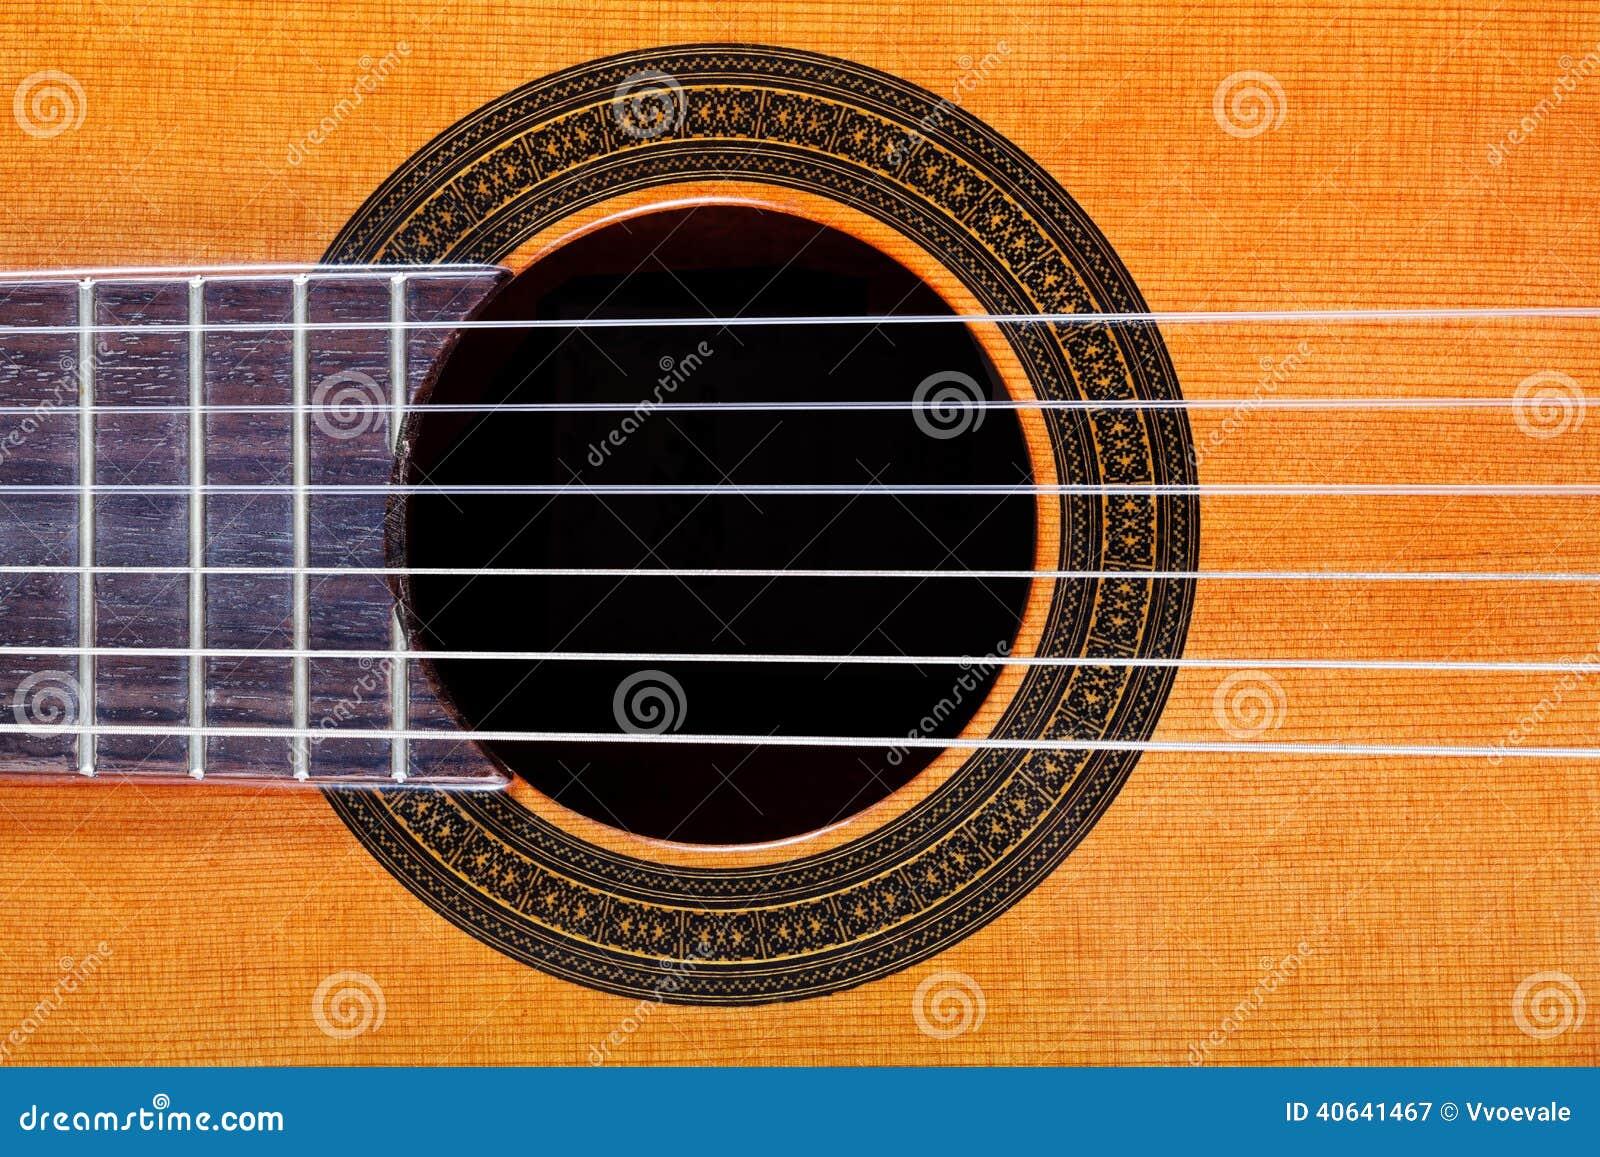 Gitarre Rosette Schallloch für Akustik Gitarre Gitarre Rosette Inlay